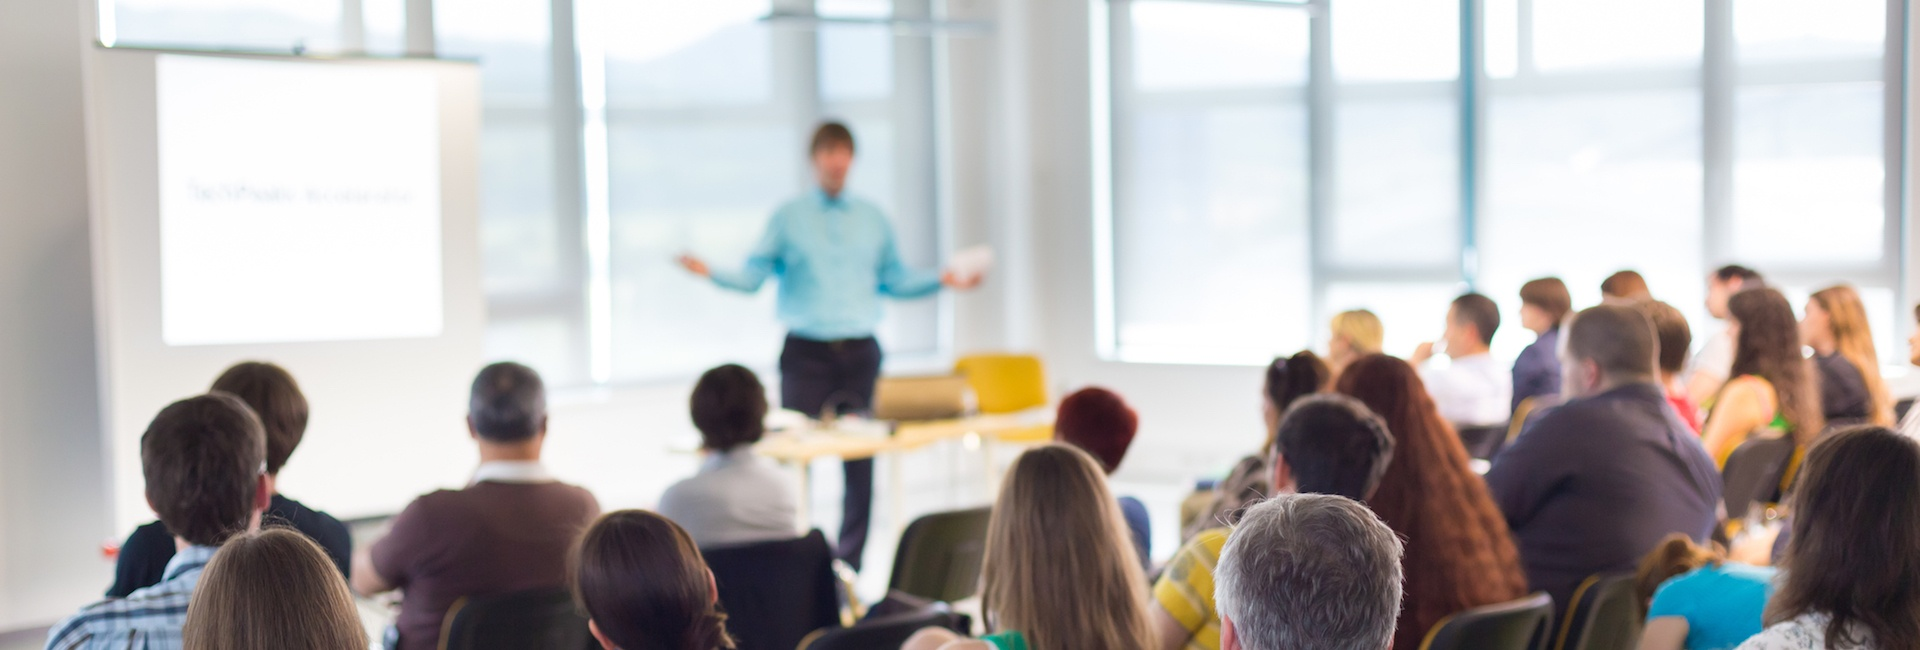 Inbound Marketing Philosophy, Methodology, and Tools